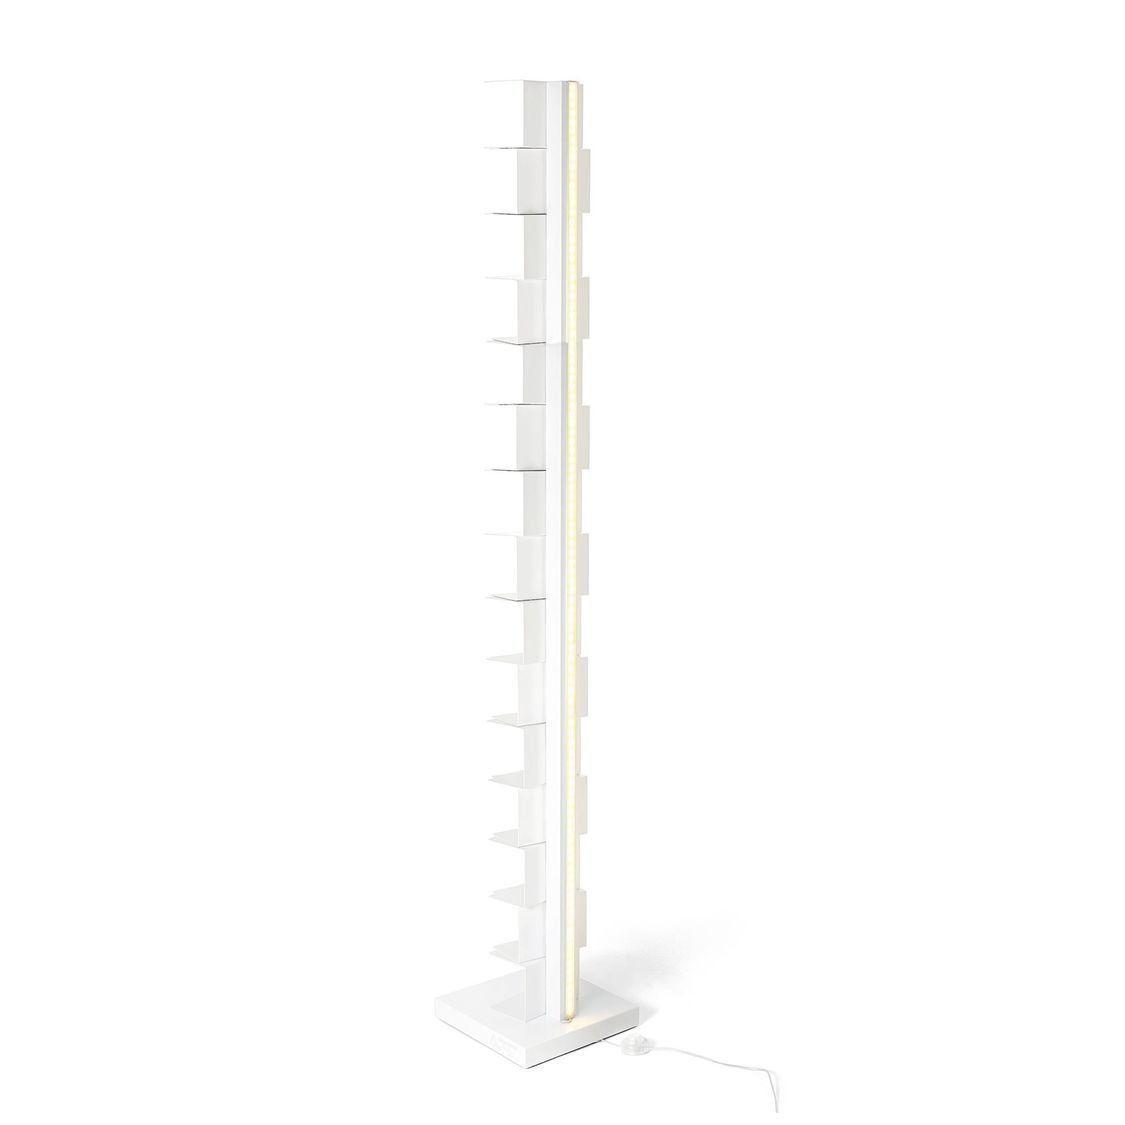 opinion ciatti ptolomeo luce 215 biblioth que colonne led ambientedirect. Black Bedroom Furniture Sets. Home Design Ideas